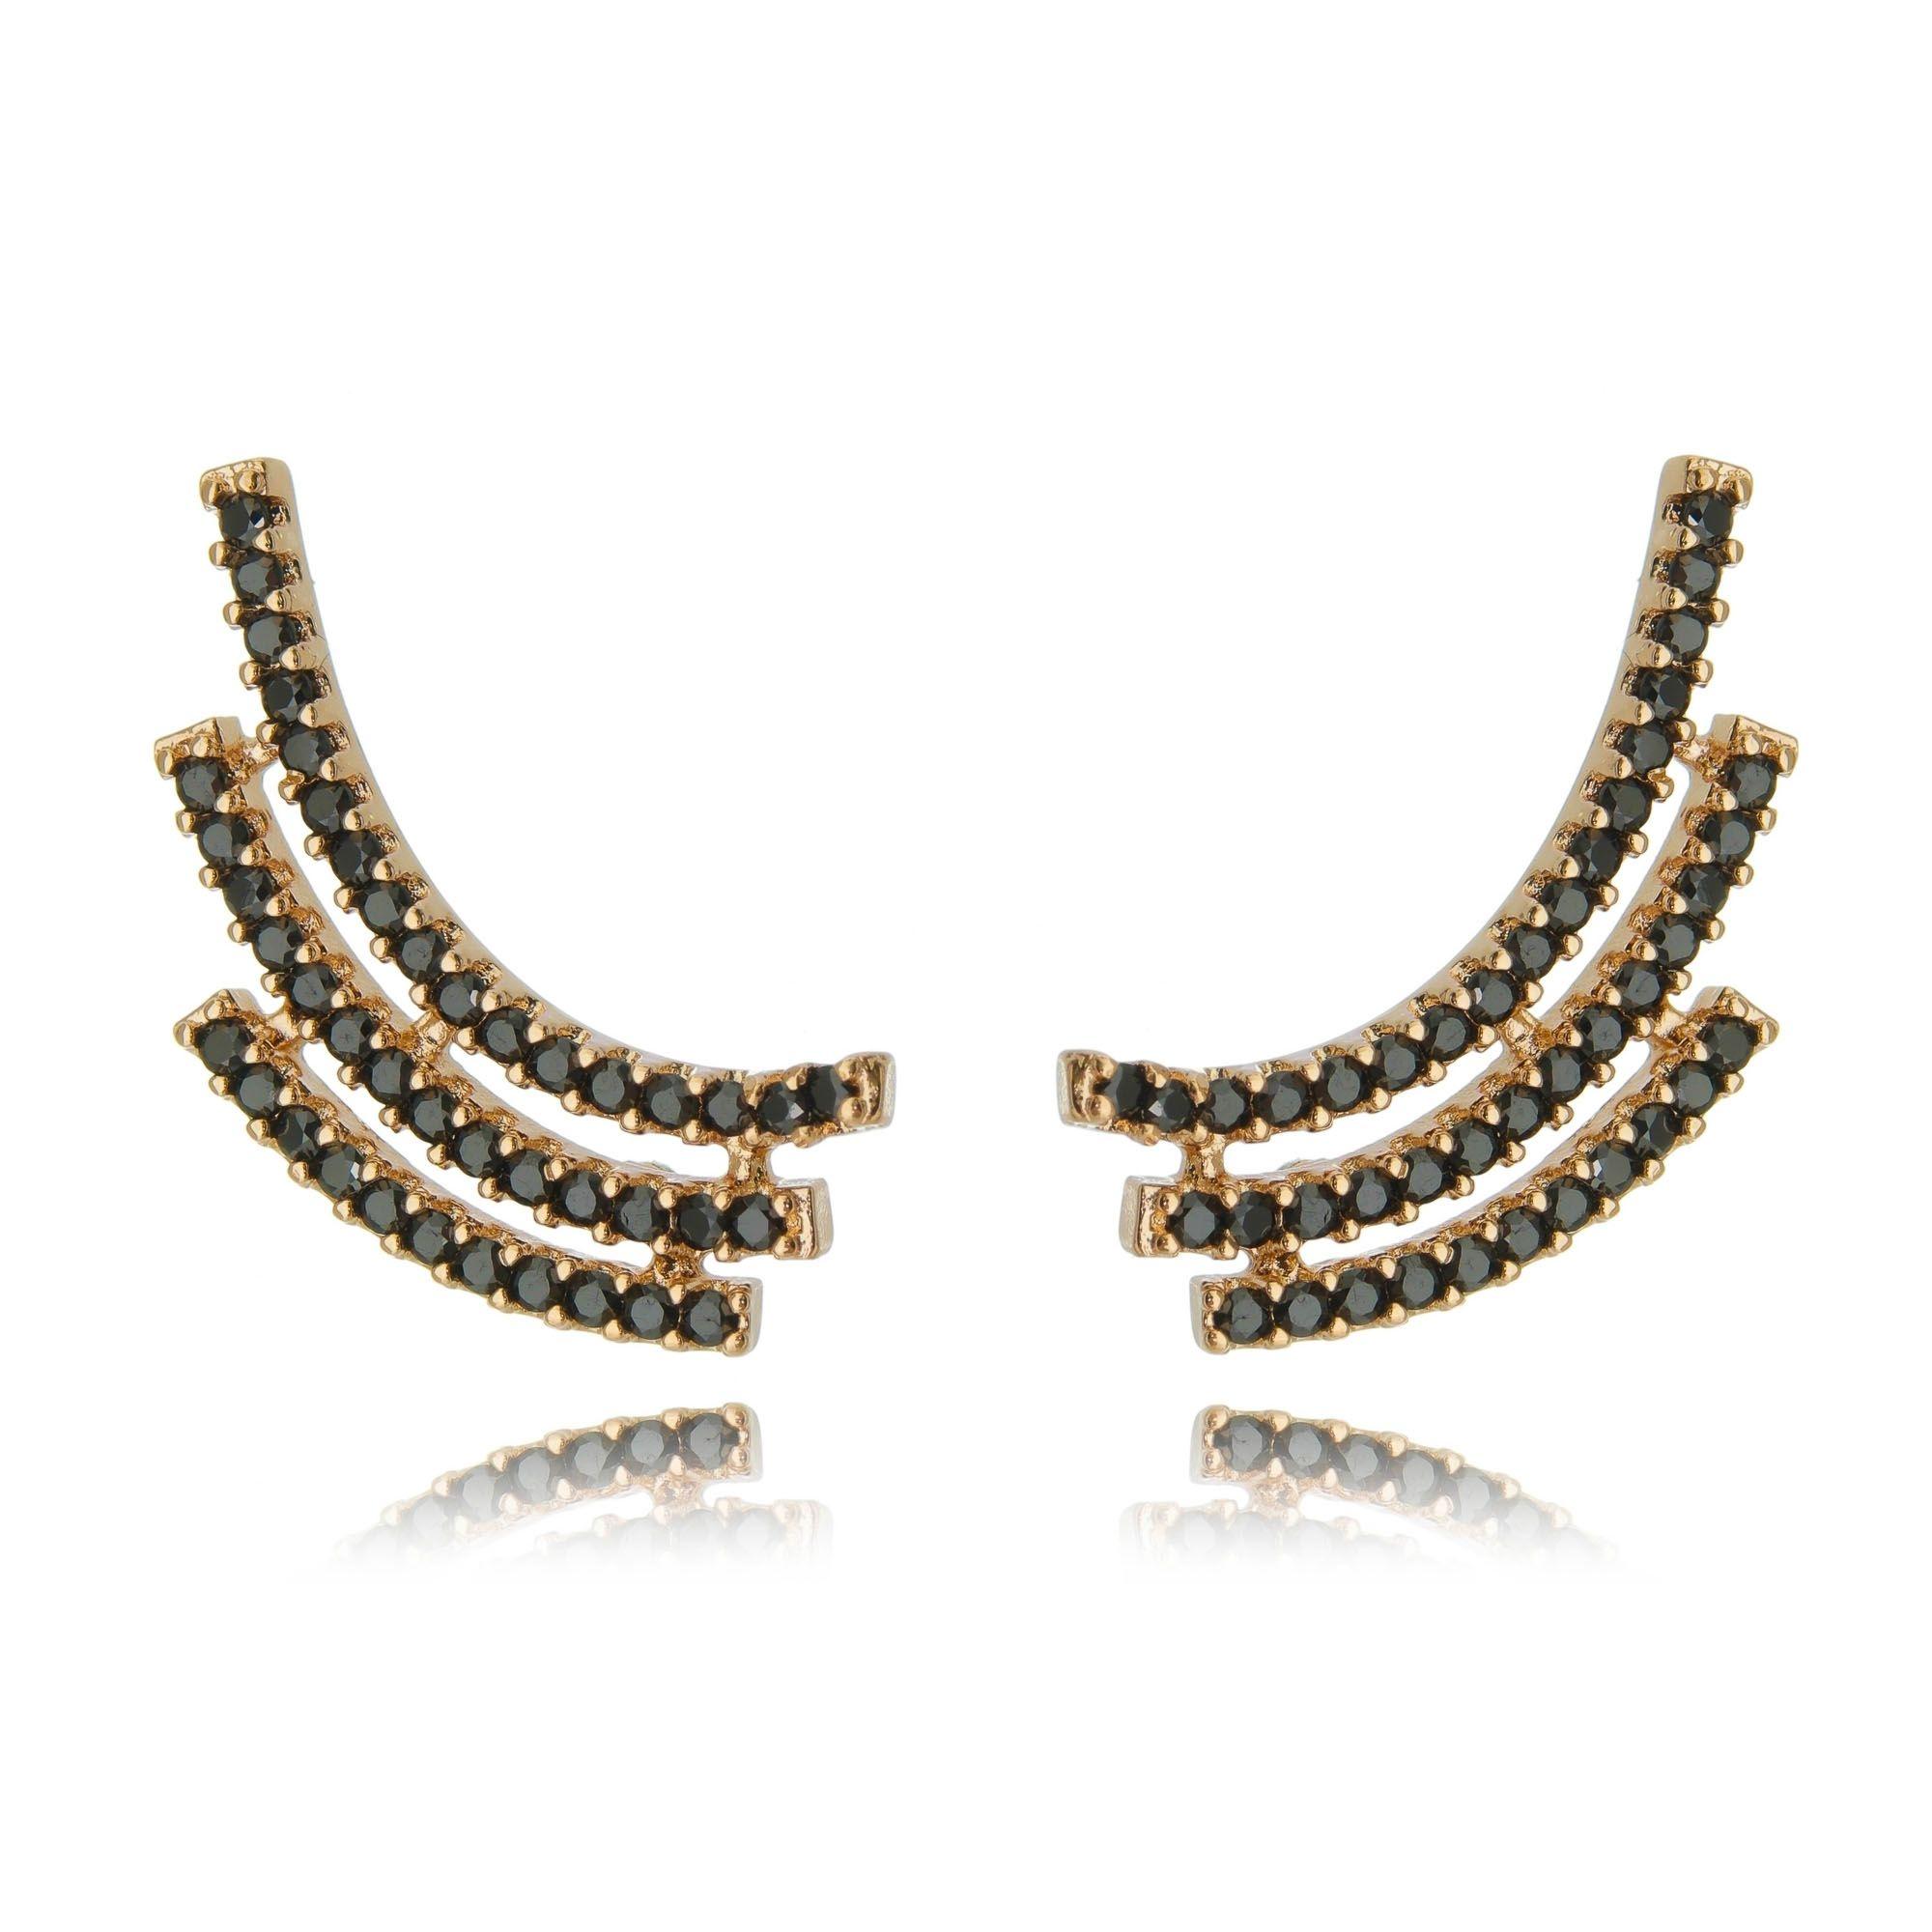 Ear Cuff Ouro Rosé com Zircônia Negra Semijoia Moderna  - Soloyou